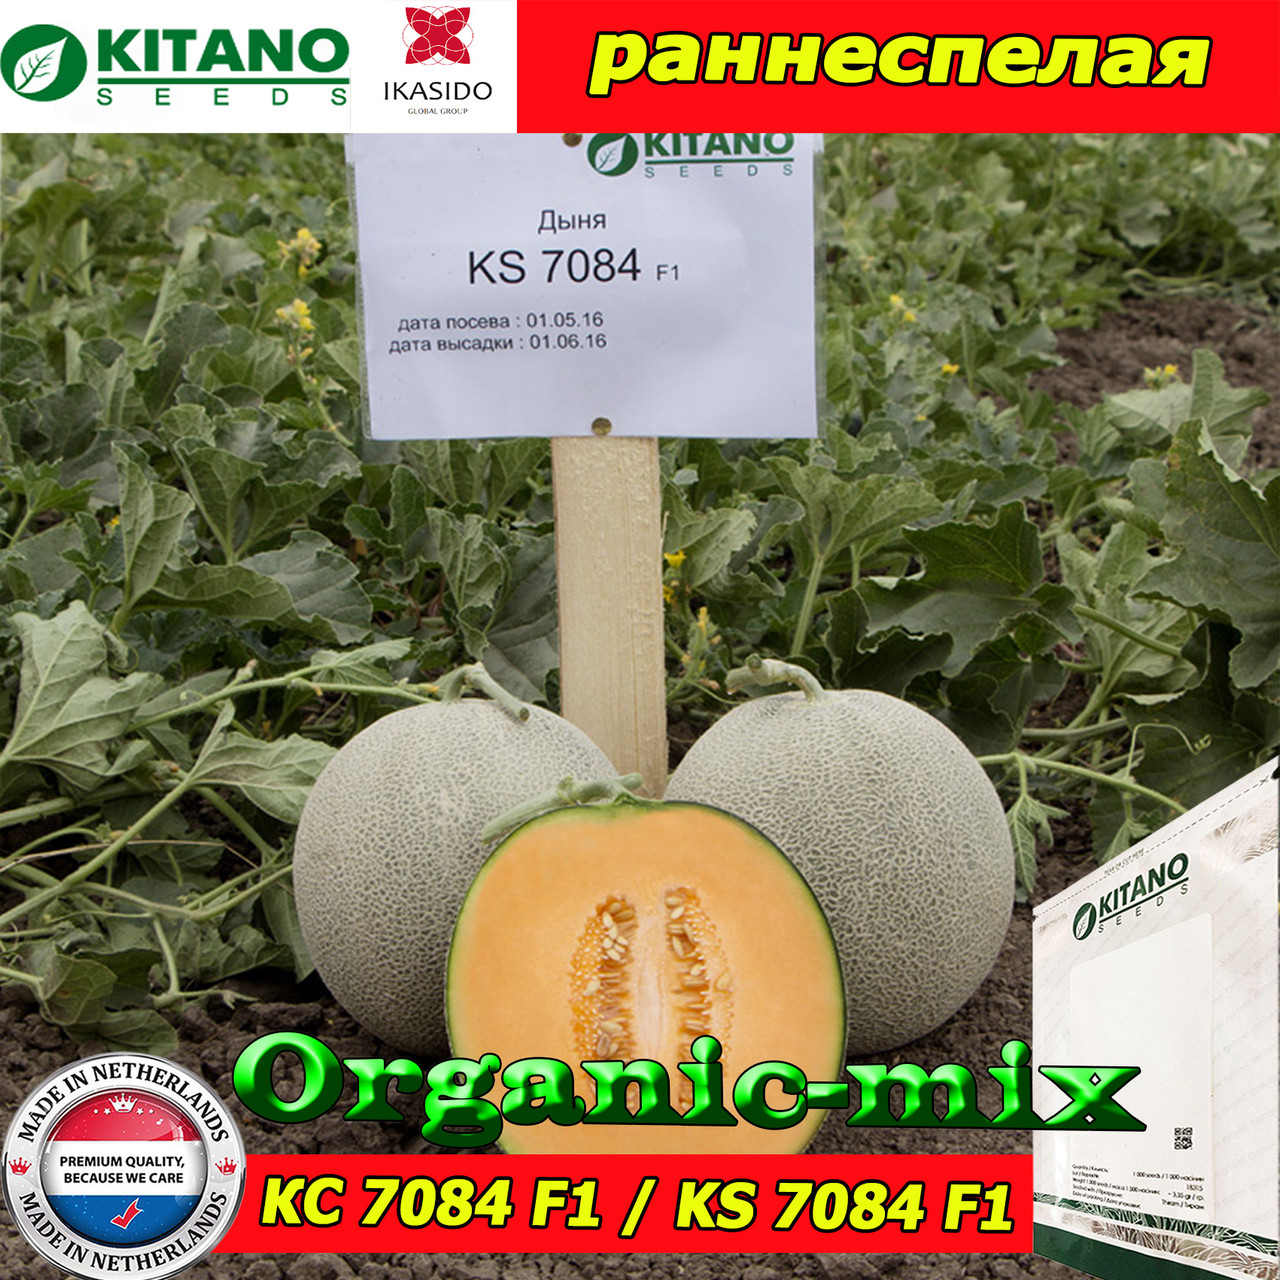 Семена, дыня КС 7084 F1 / KS 7084 (раннеспелая), 100 семян ТМ Kitano Seeds (Нидерланды)